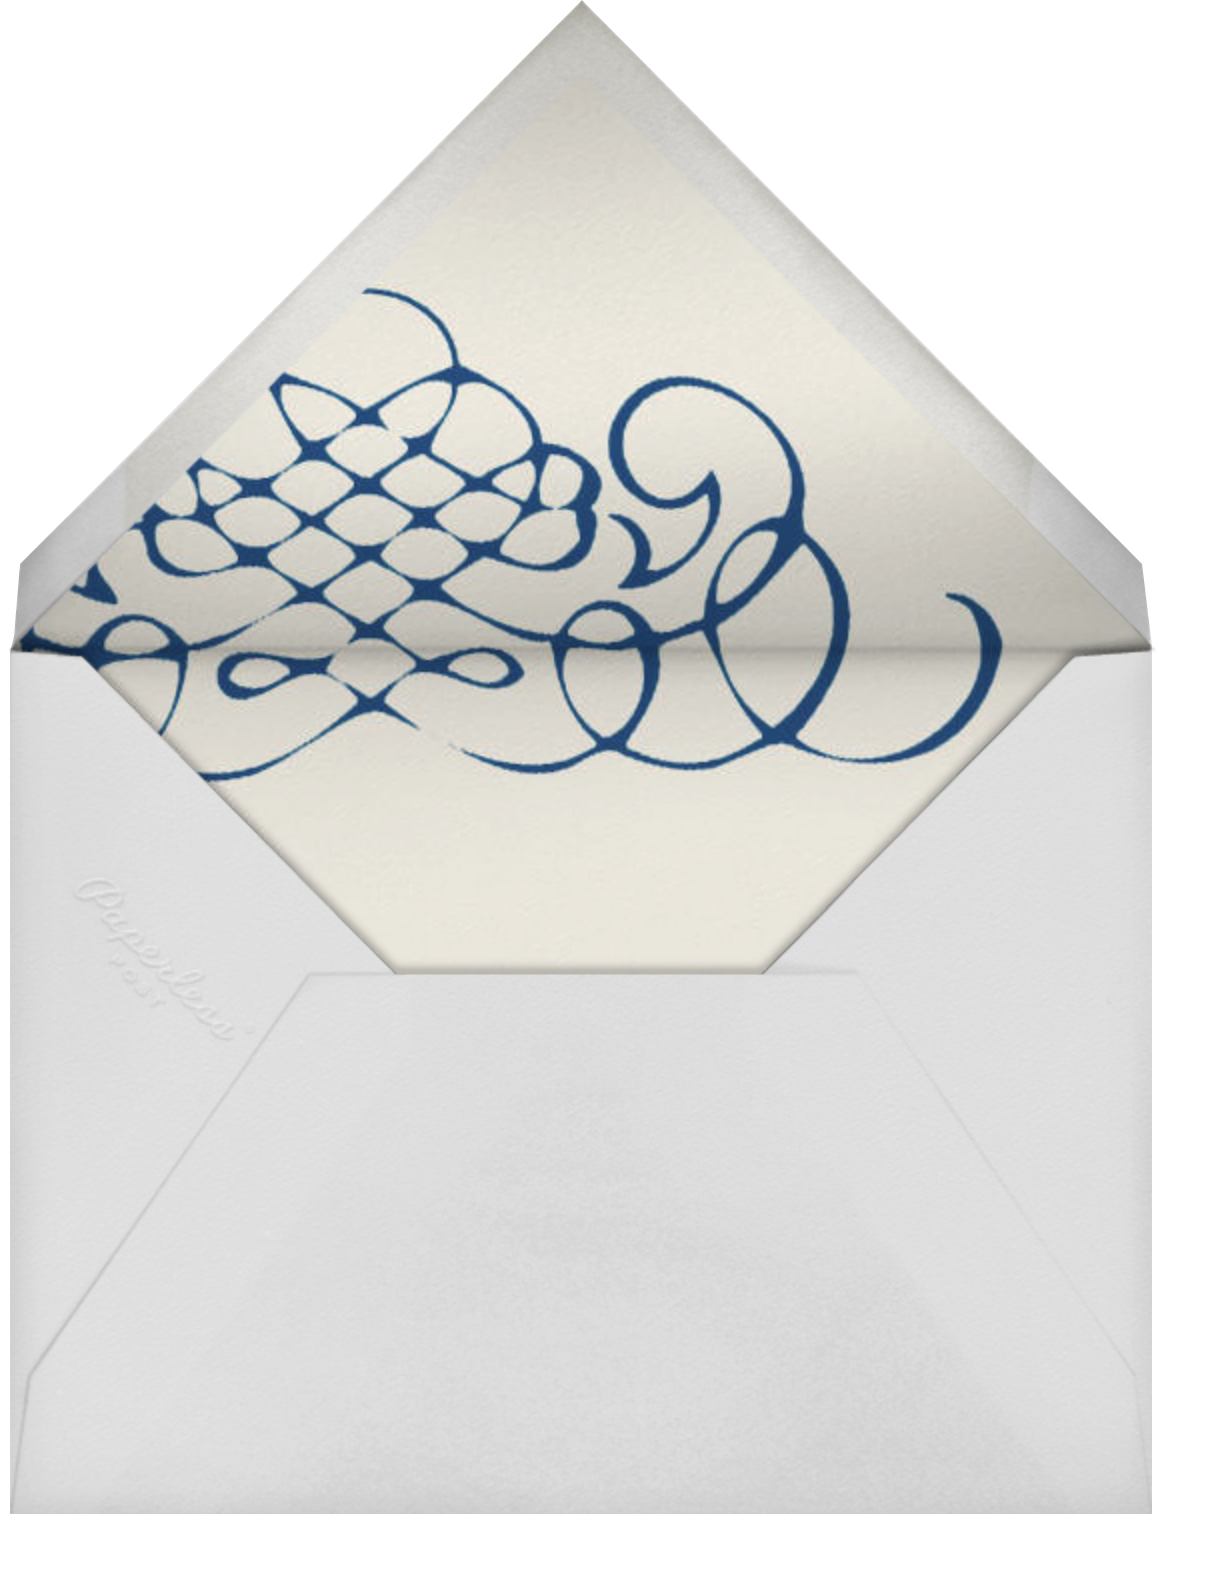 Antique Press- Cream with Dark Blue (Horizontal) - Paperless Post - Envelope